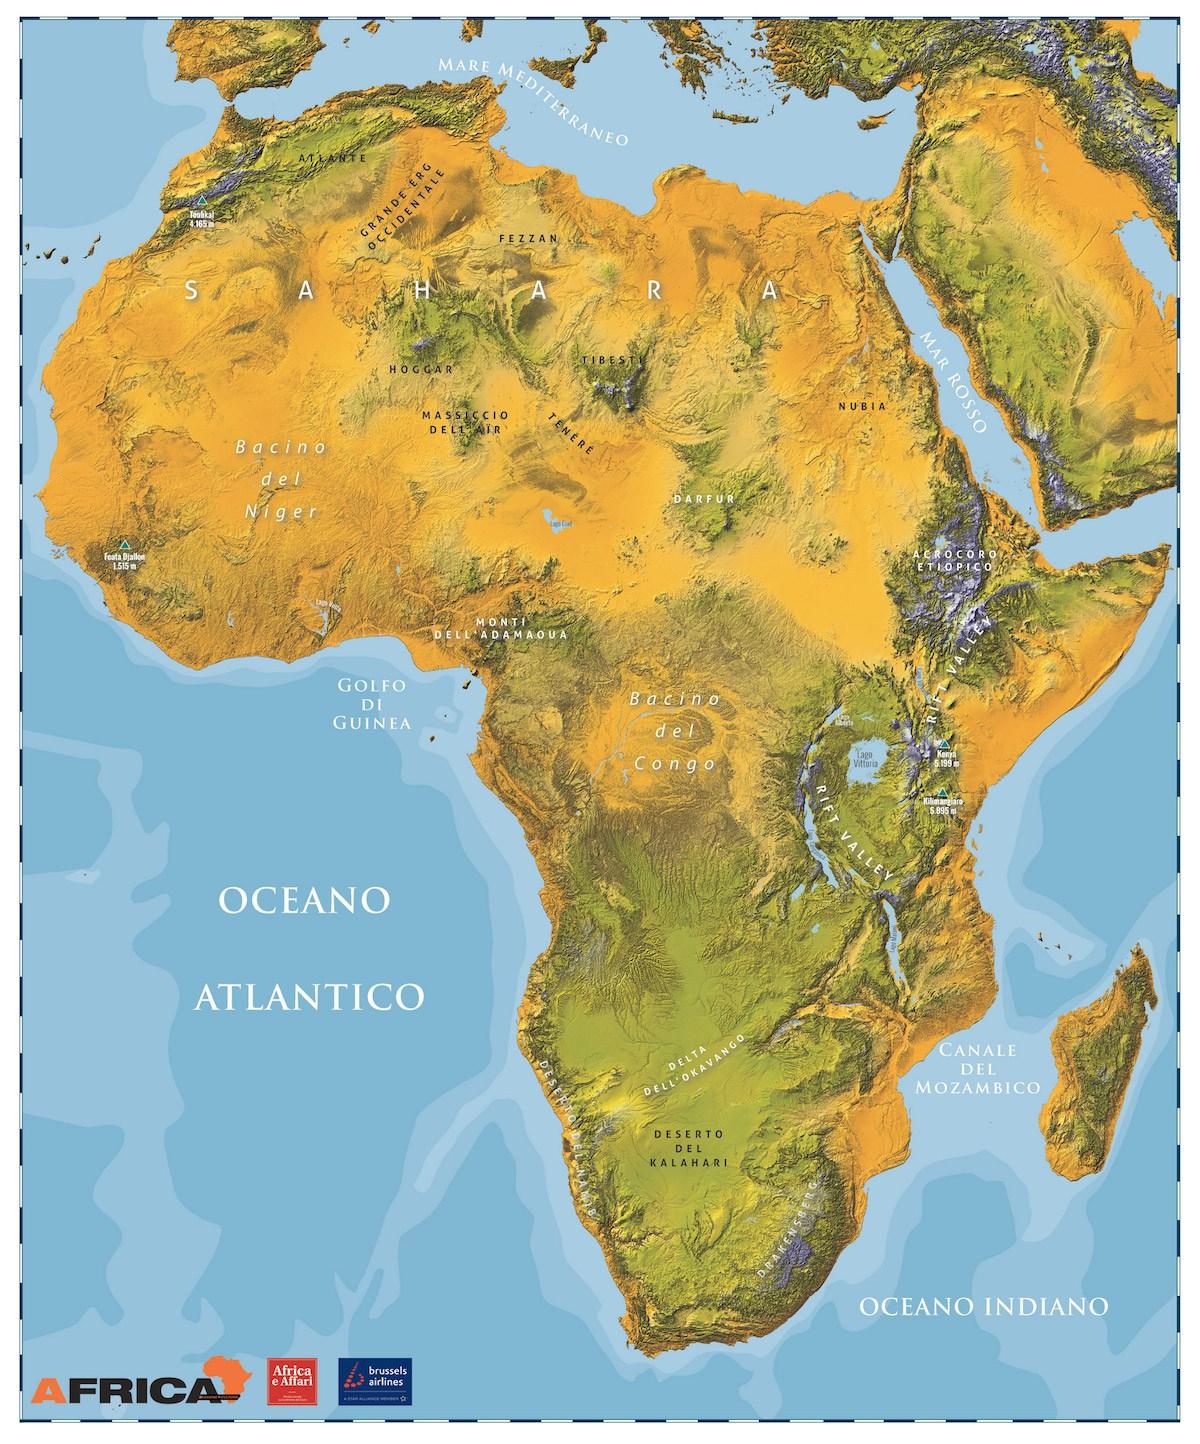 africano adolescenza canale